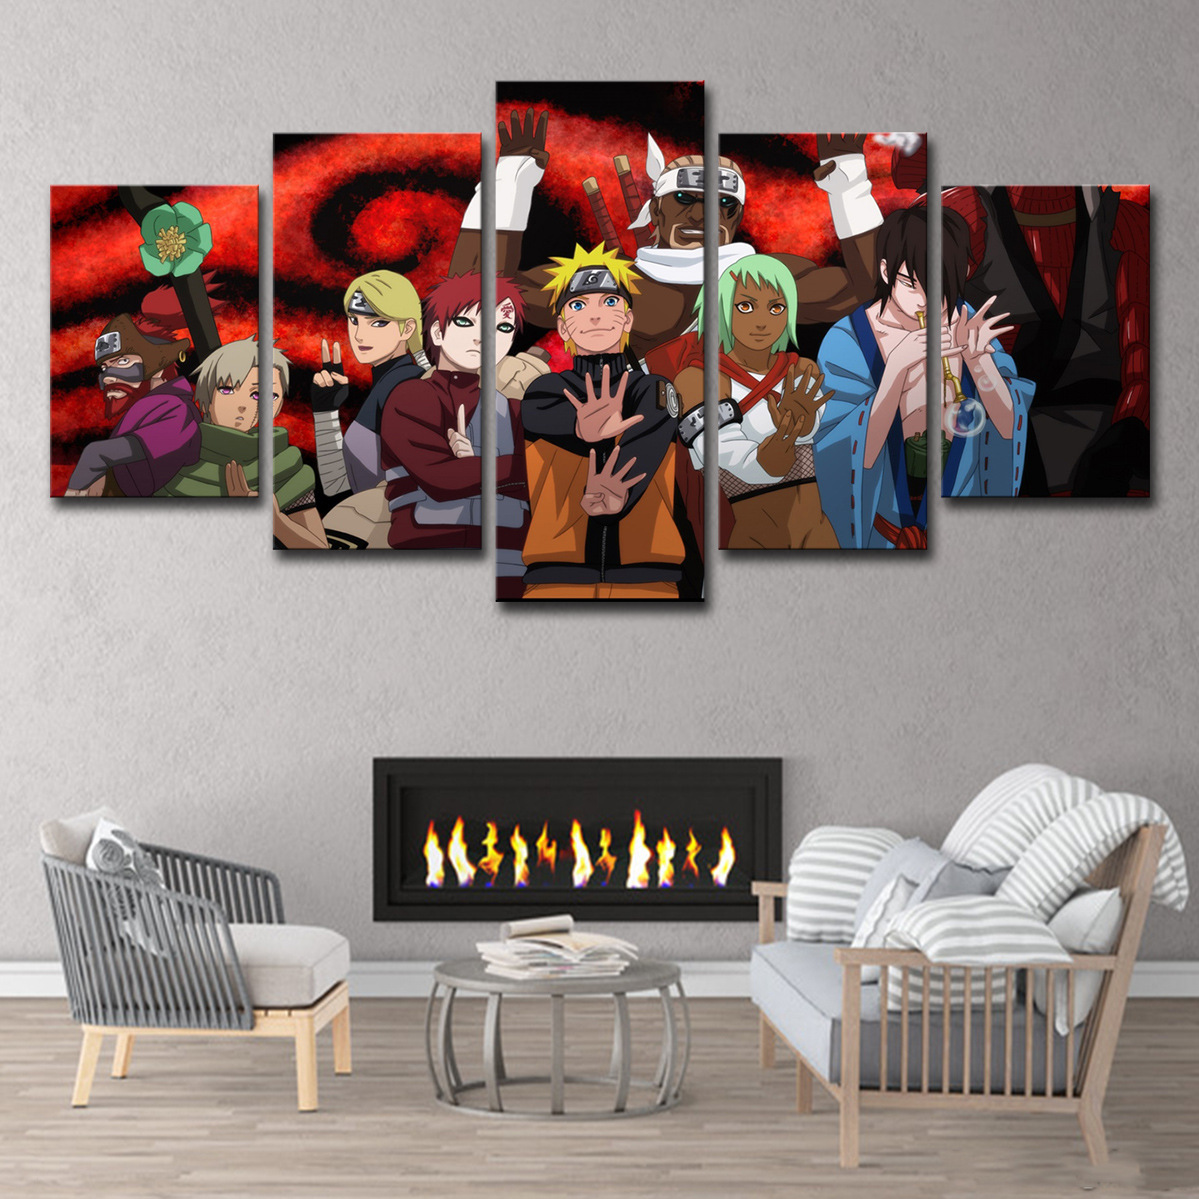 5 Piece Canvas Art Naruto Jinchuuriki Anime Cuadros Decoracion Paintings Wall Art for Home Decorations Wall Decor 1